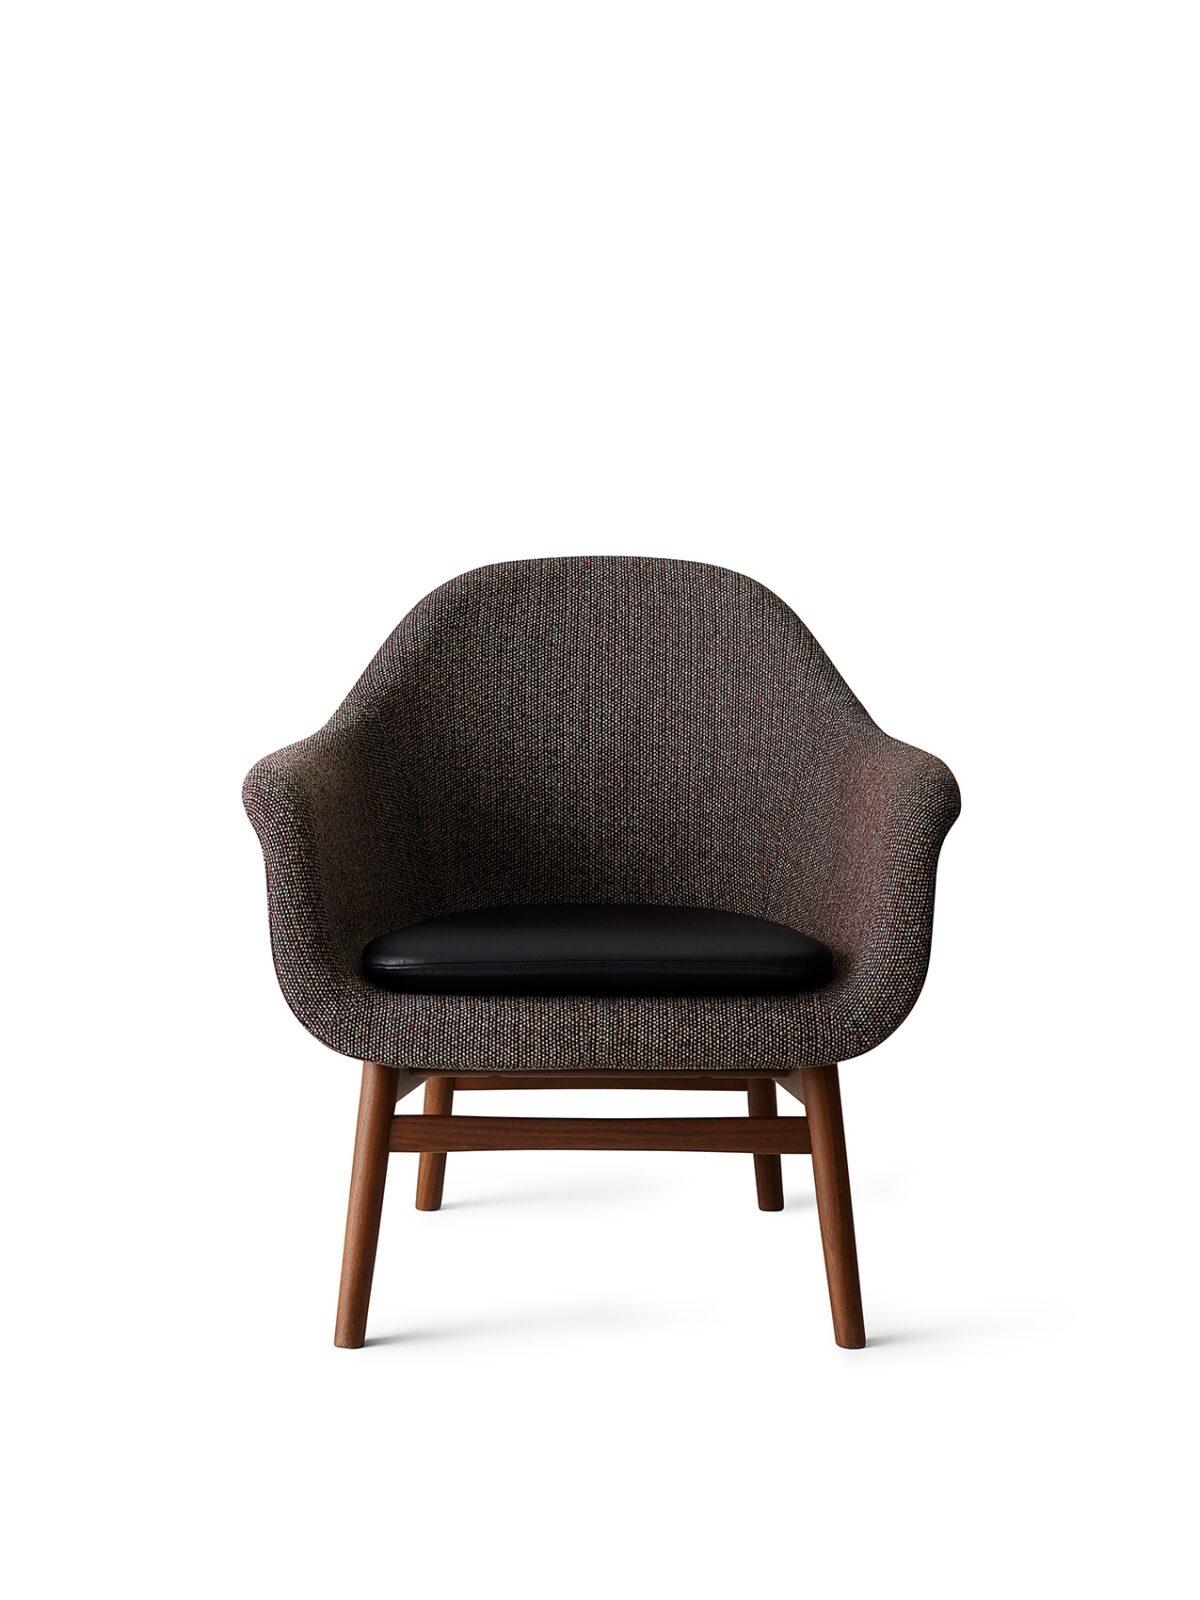 9255549 Harbour Lounge Low back Walnut Savanna 675 Shade Pitch black cushio front new